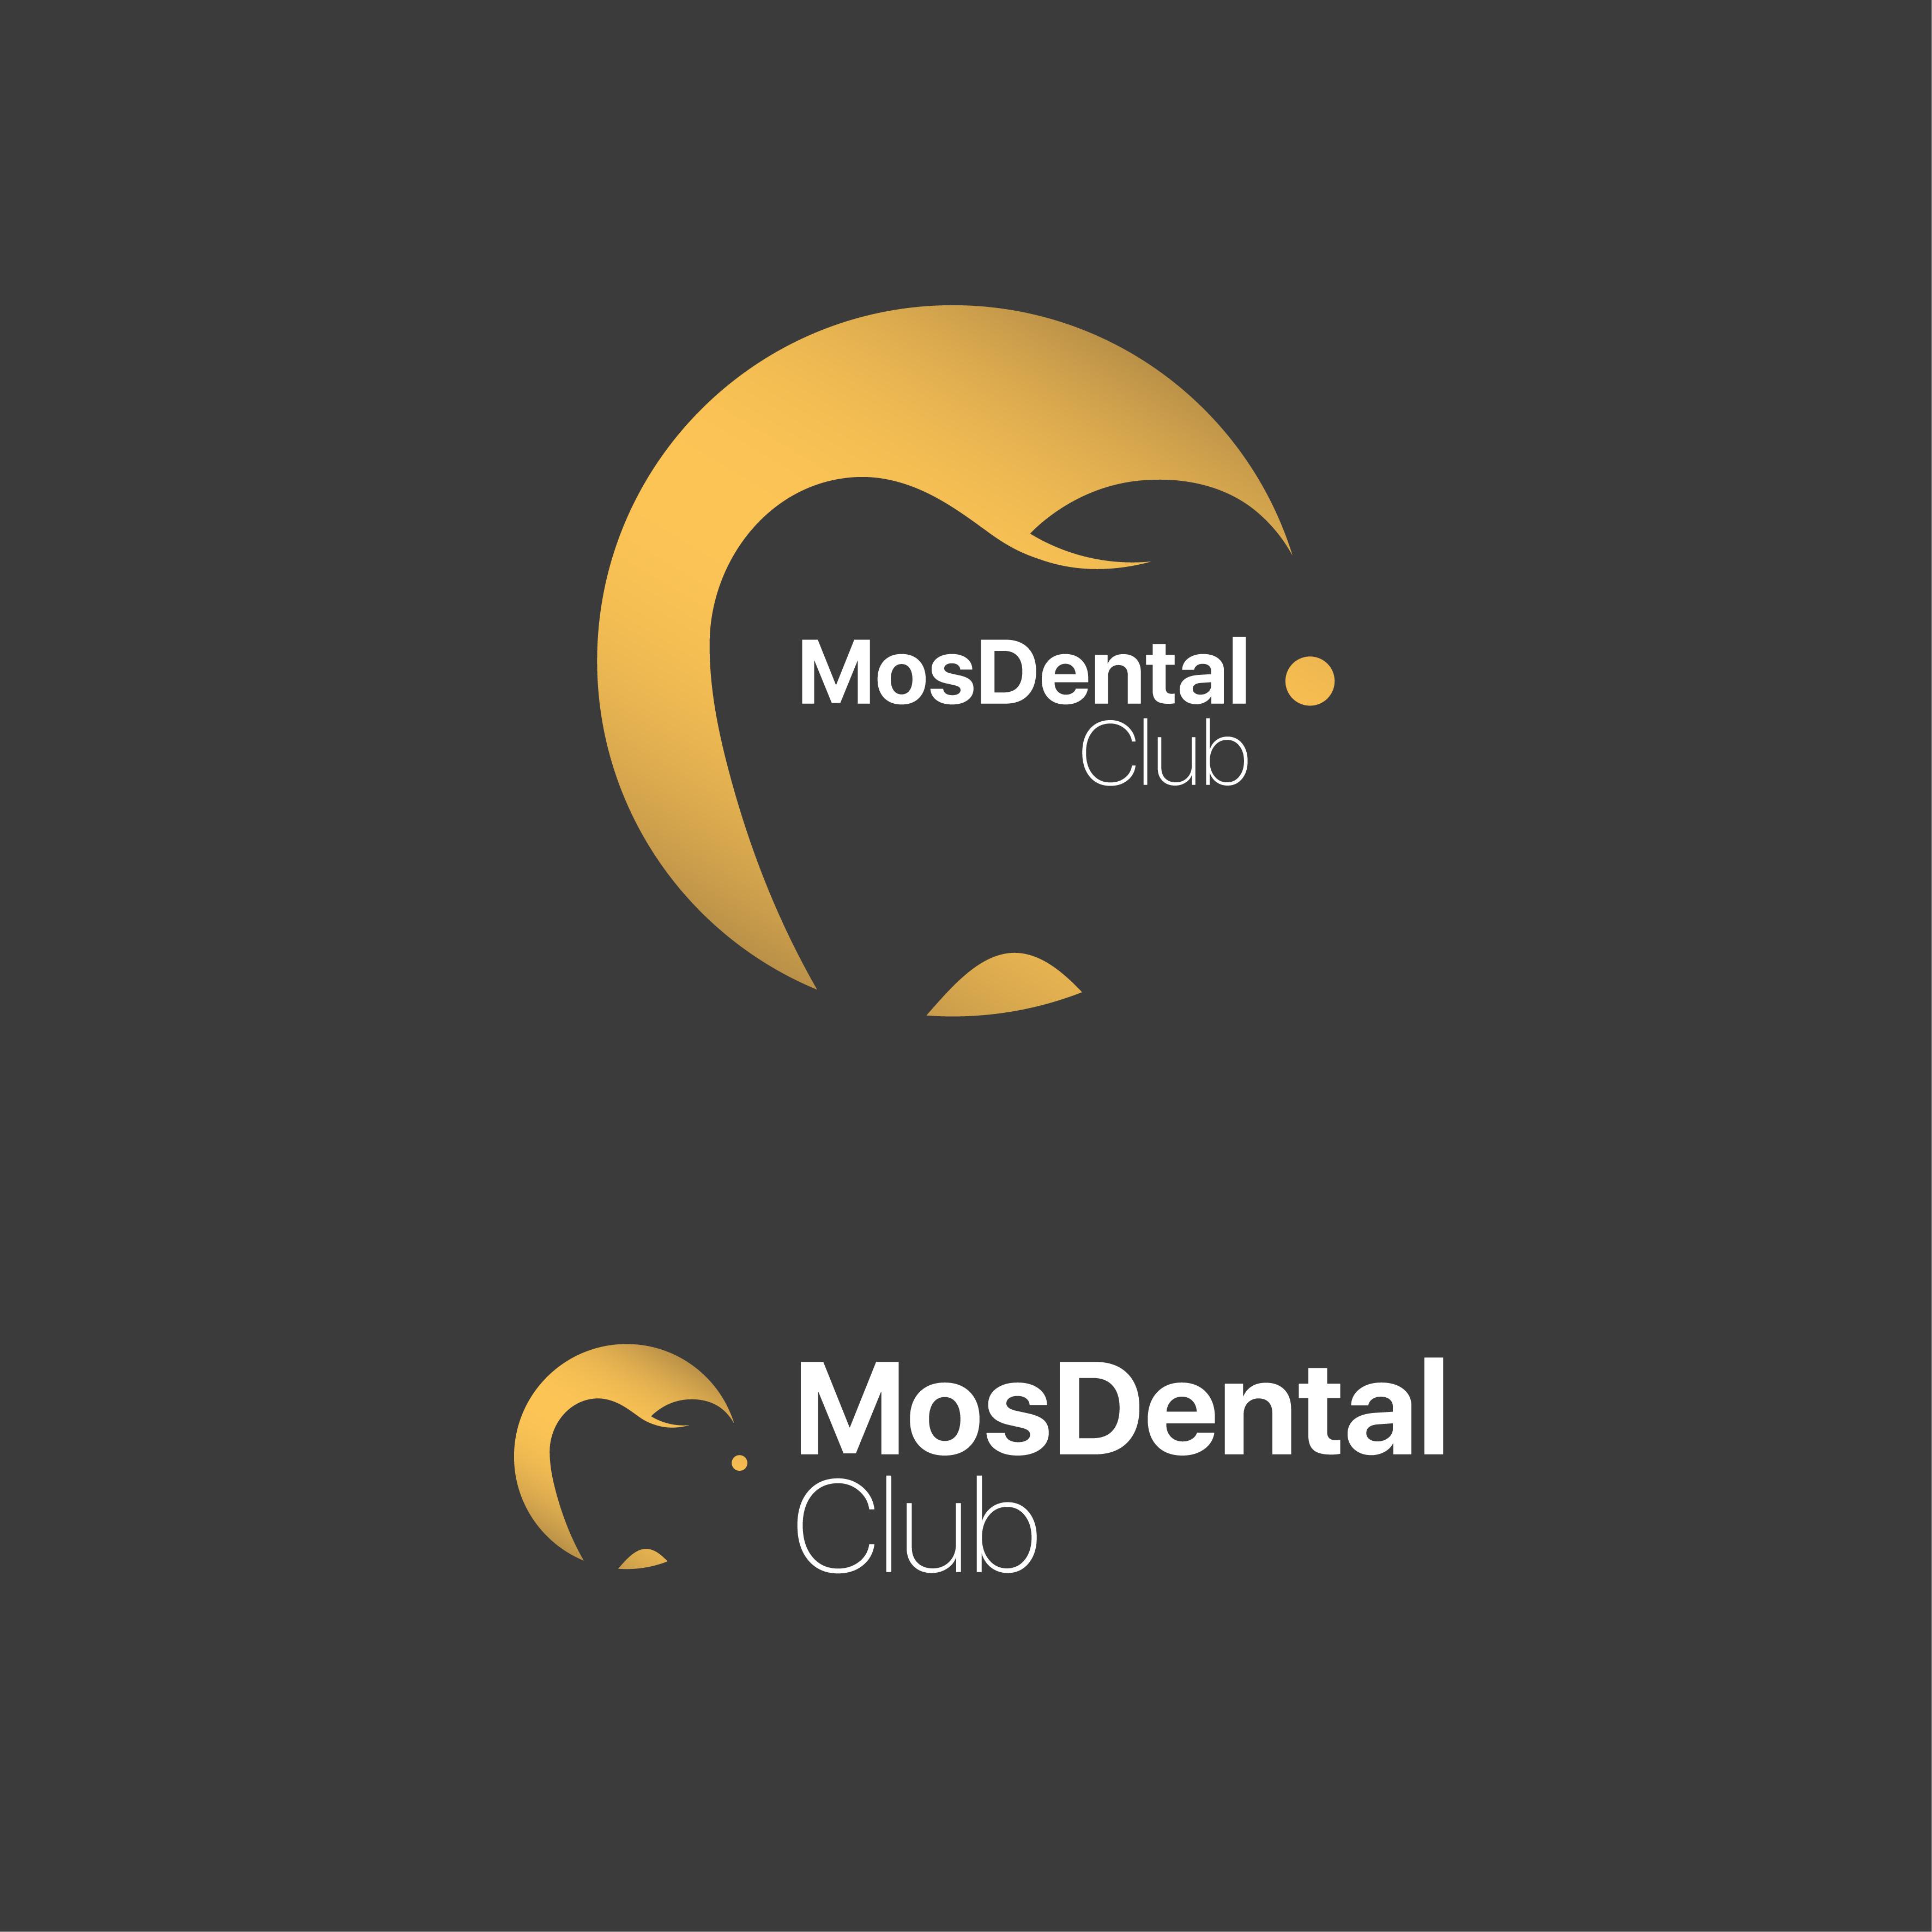 Разработка логотипа стоматологического медицинского центра фото f_4355e45164db8e05.jpg